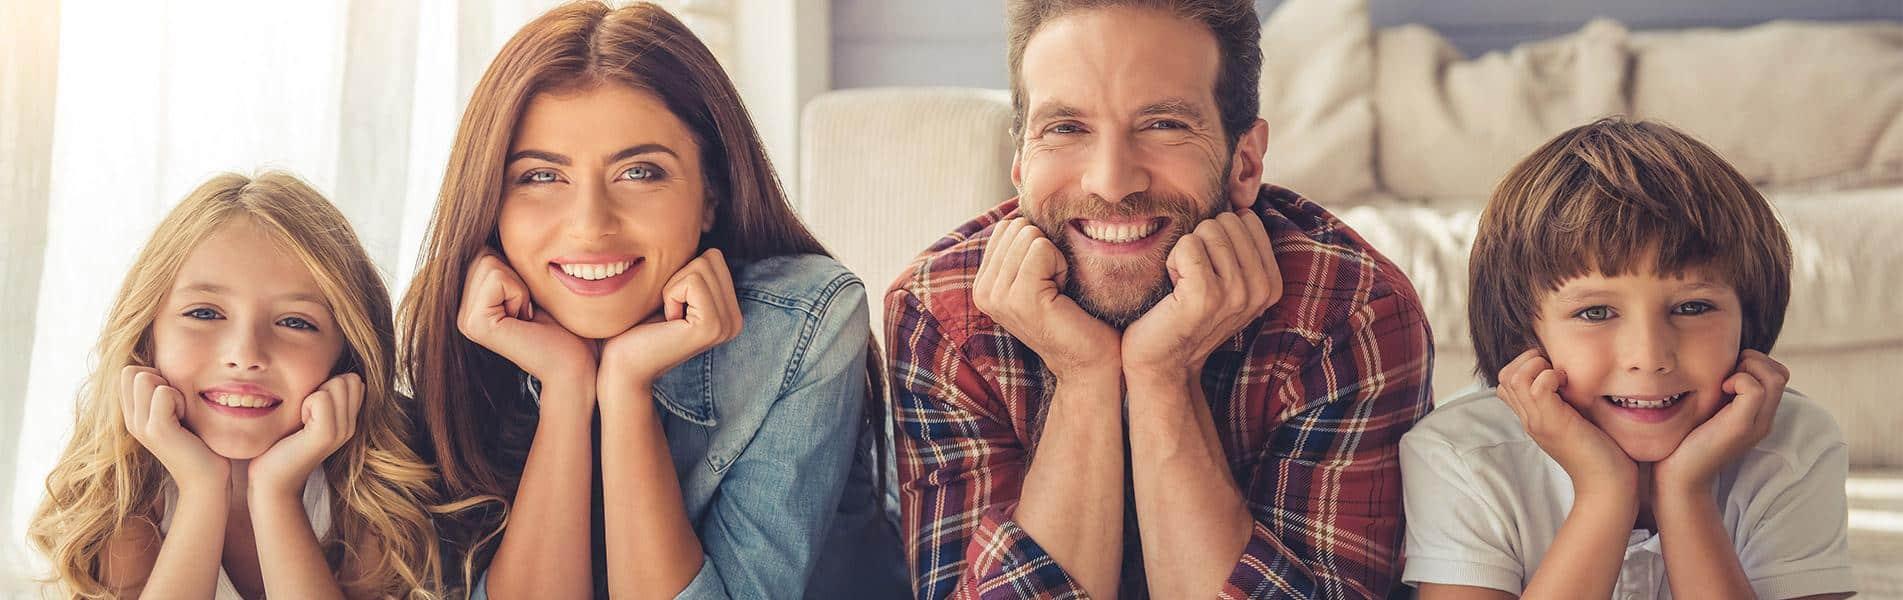 KEN for HOME - Γ1Ν - Έκπτωση 30% - Ευτυχισμένη Οικογένεια